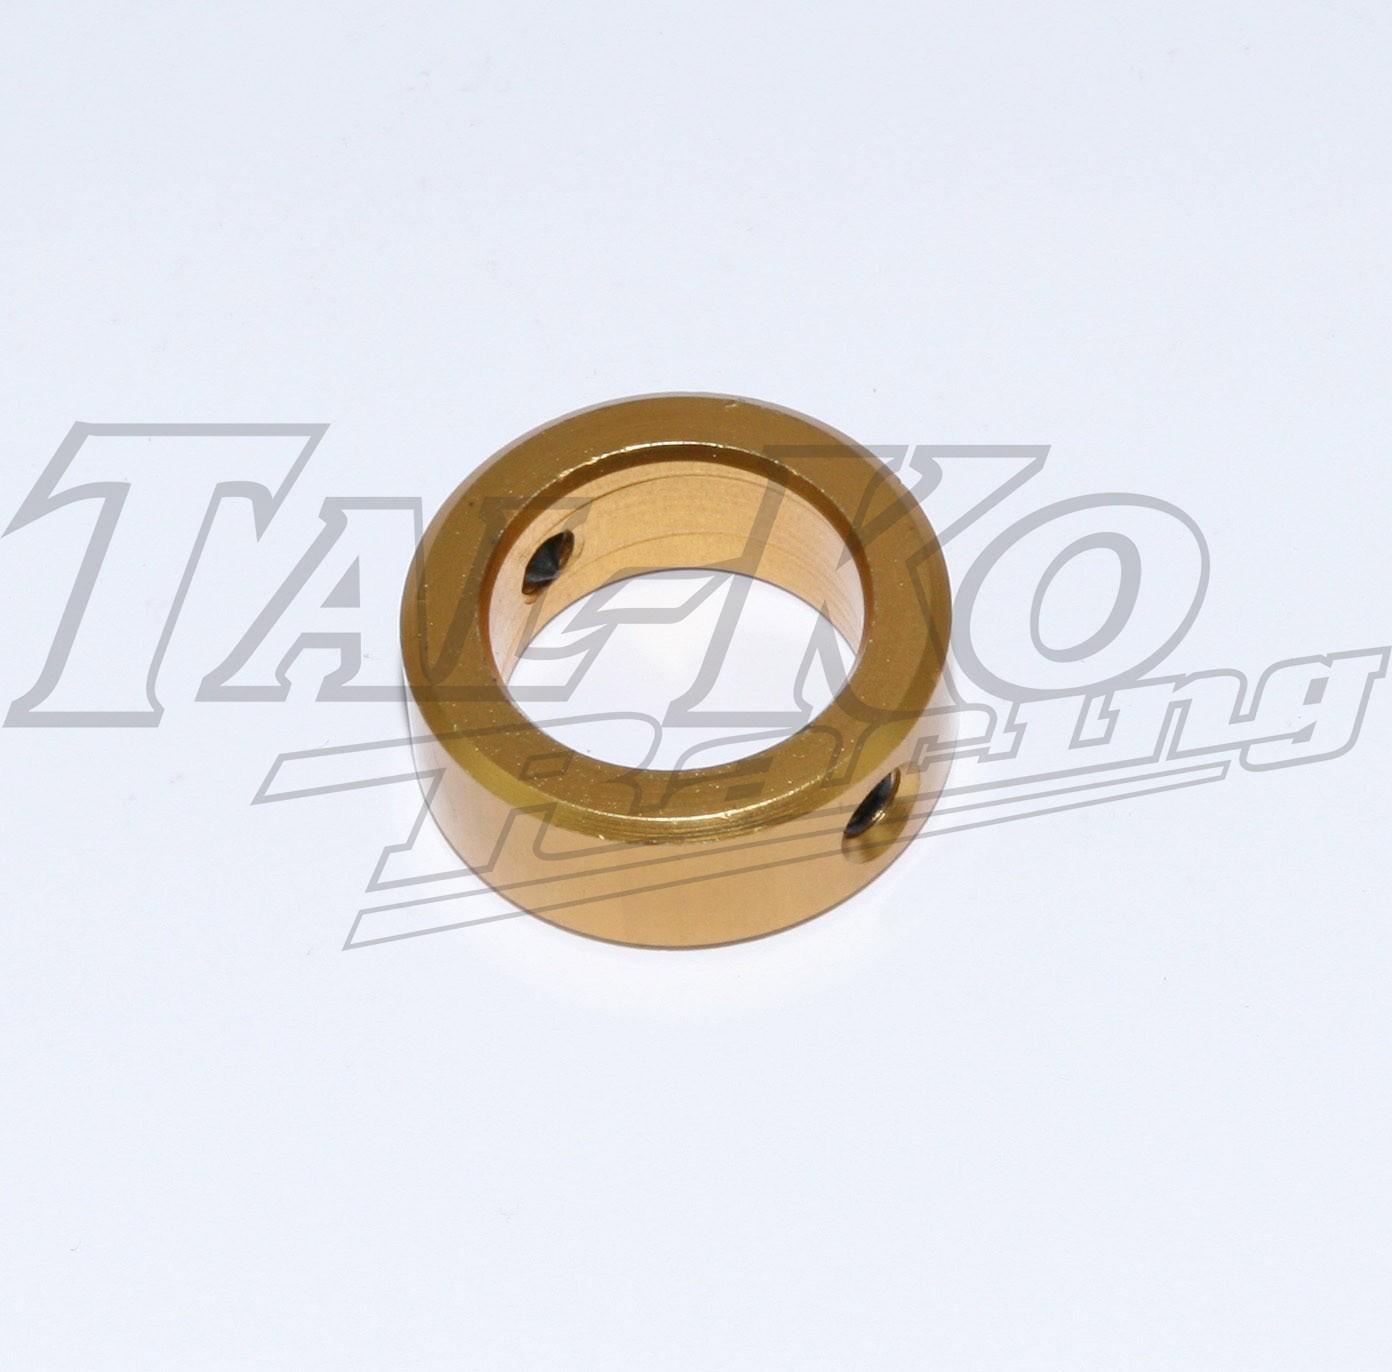 CRG STEERING COLUMN SAFETY COLLAR  GOLD